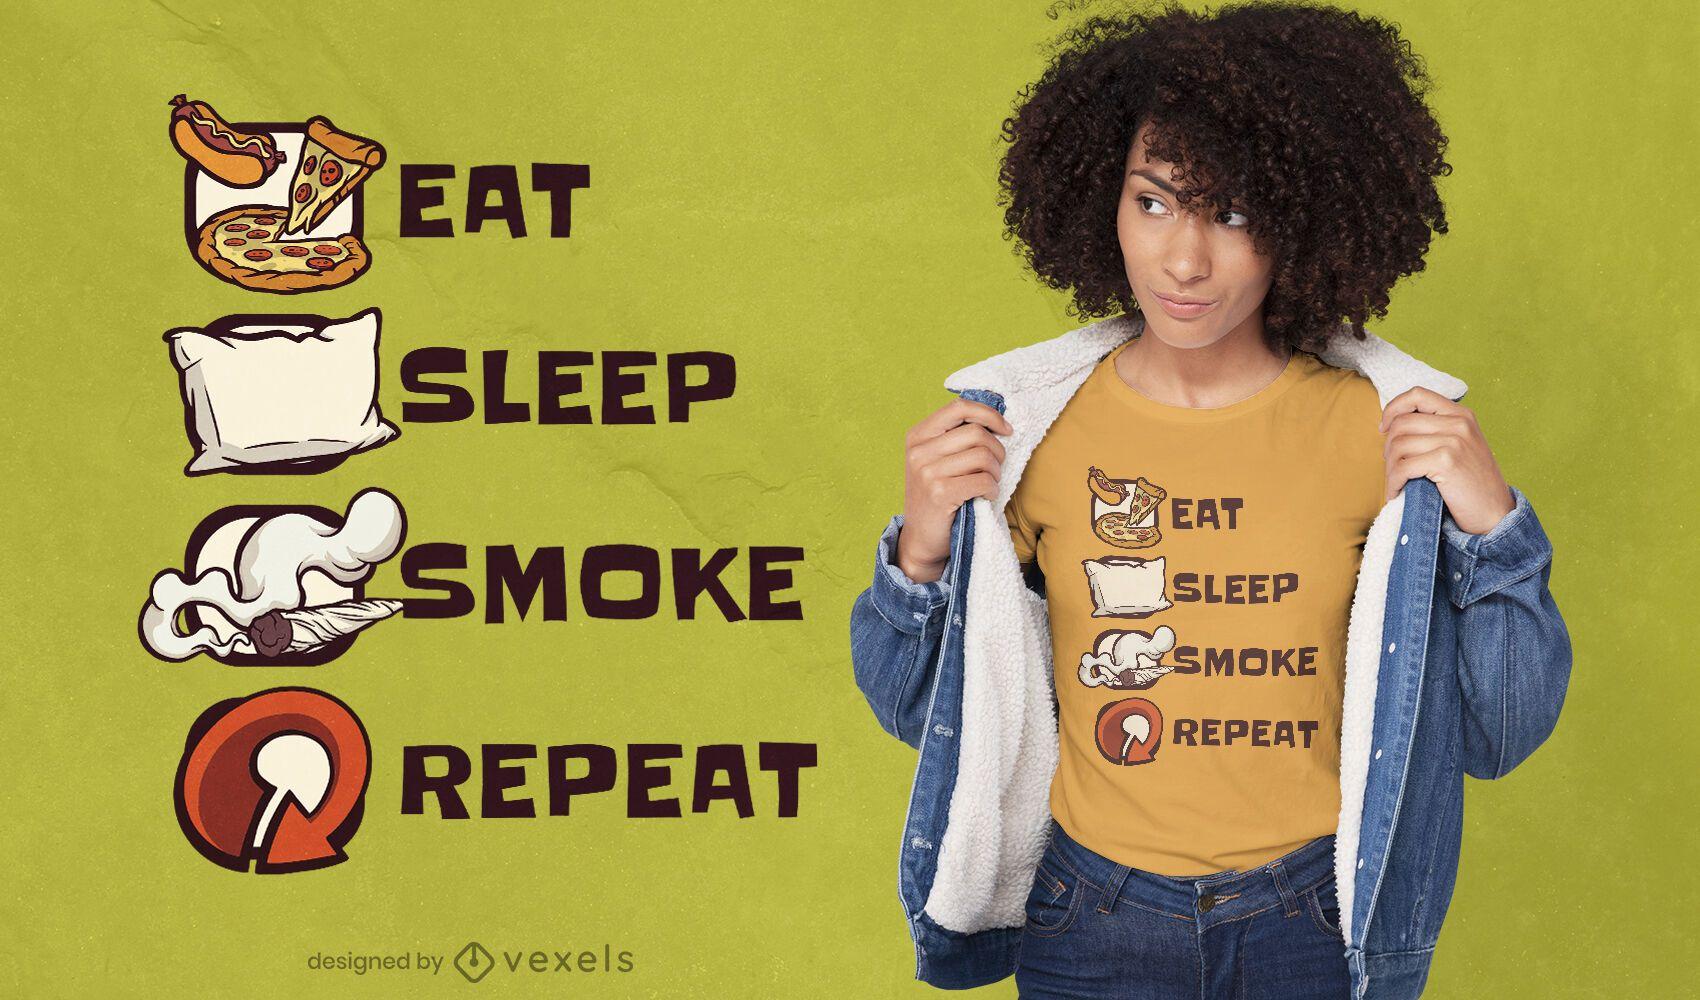 Eat sleep smoke repeat t-shirt design